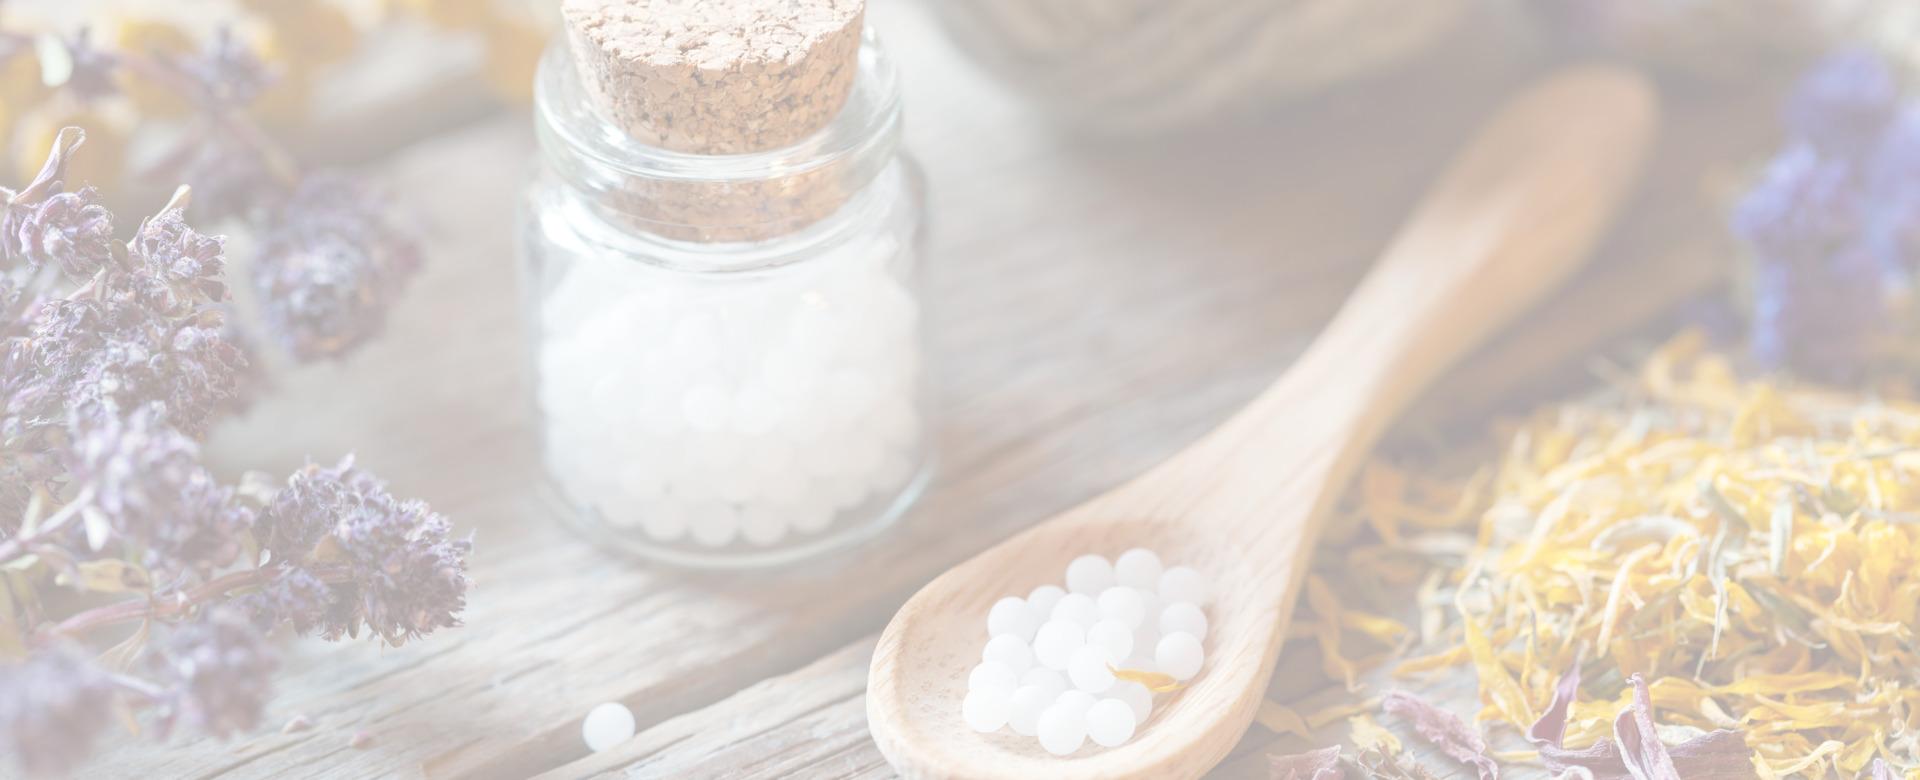 omeopatia-farmacie-caserta